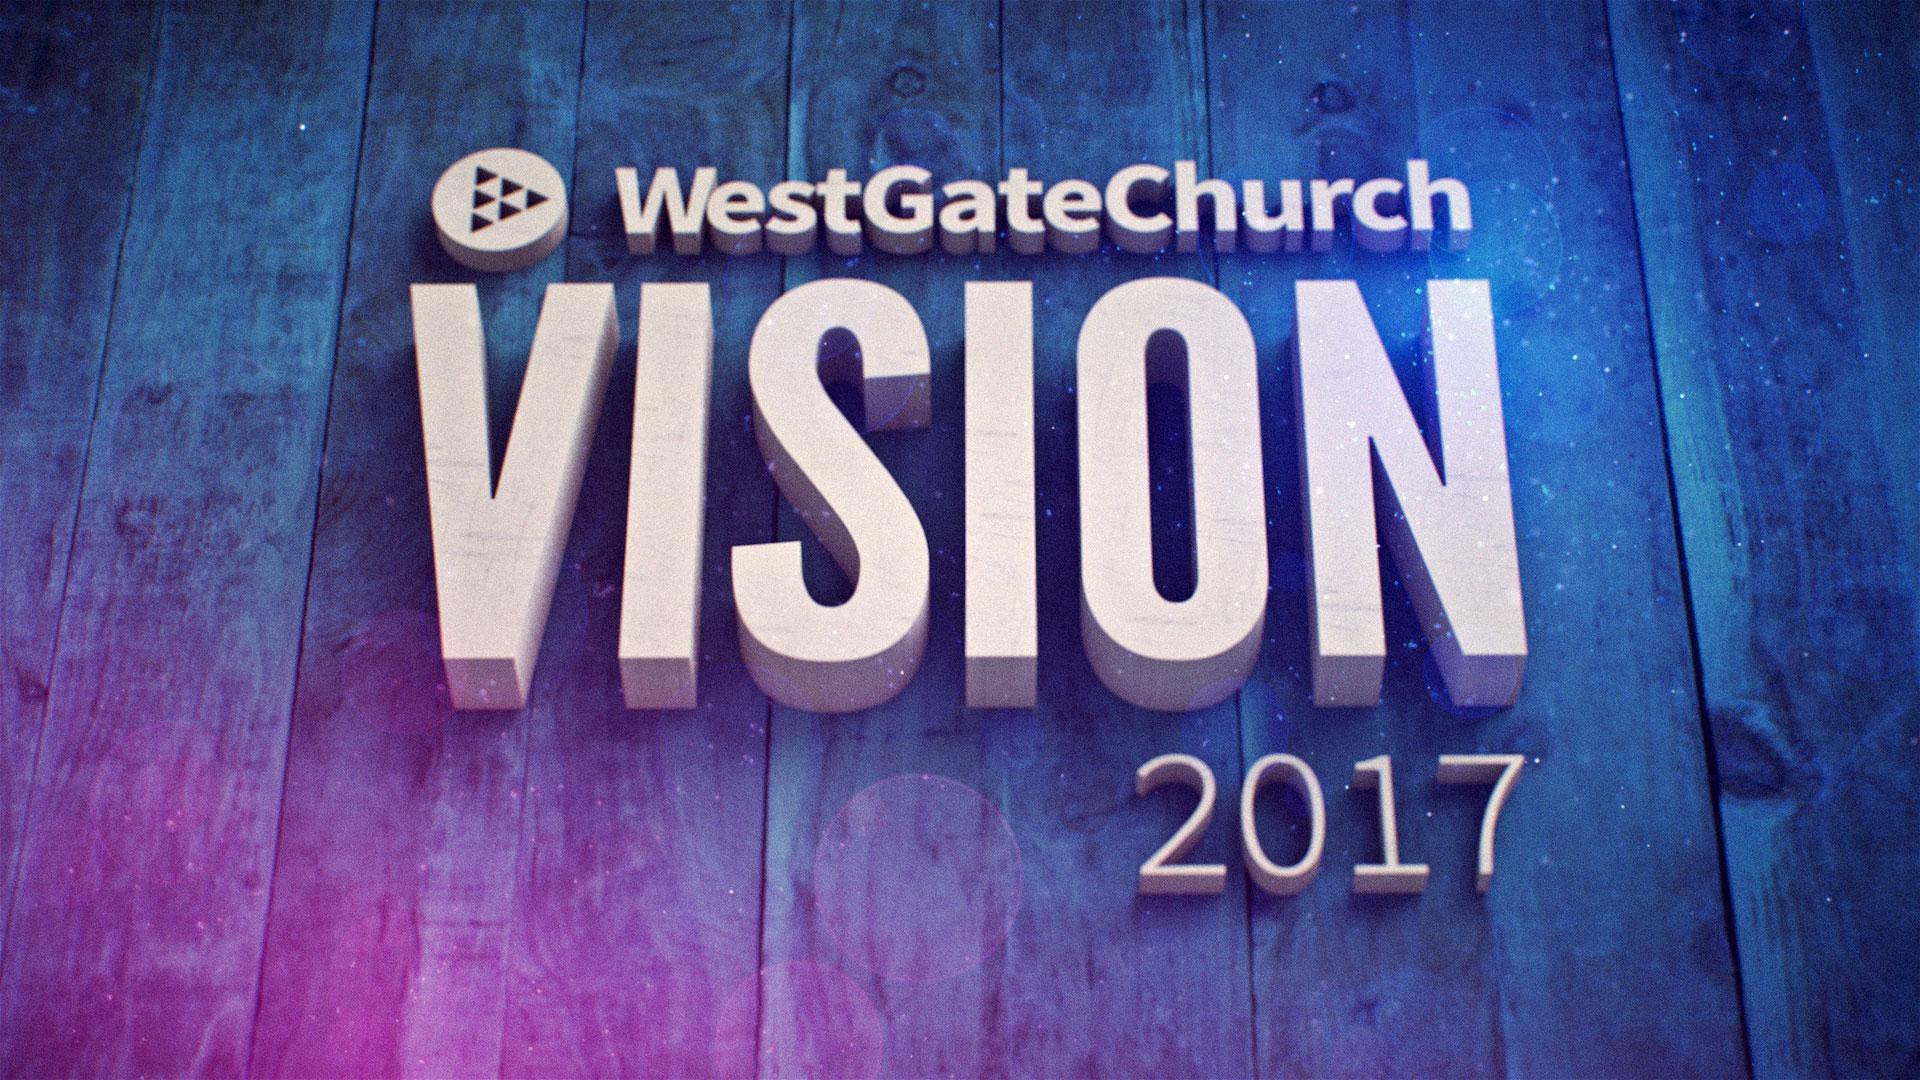 wg_vision_2017_main_title.jpg